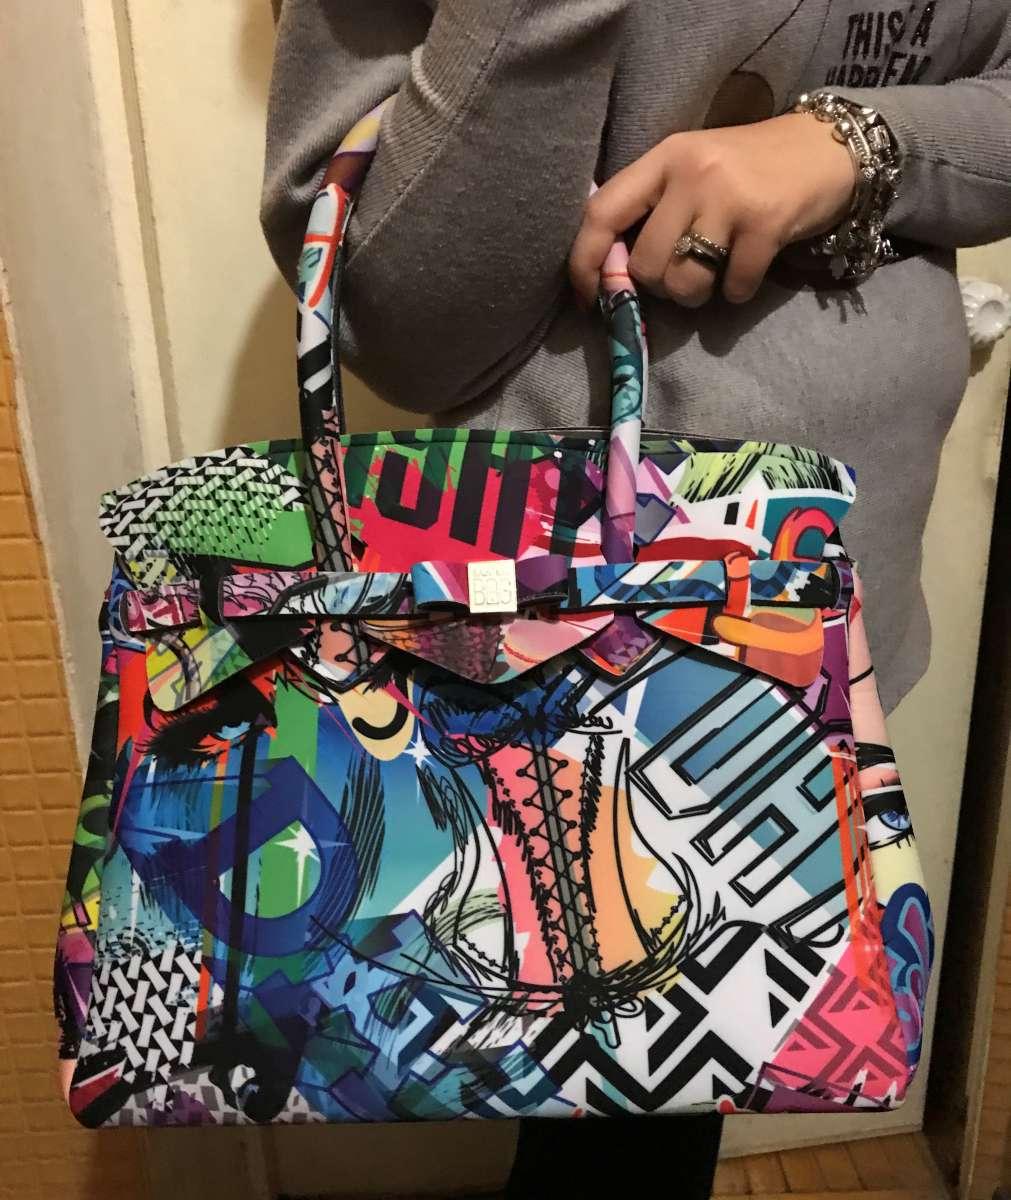 990e7b07e5d2 Сумка фирмы Save my bag